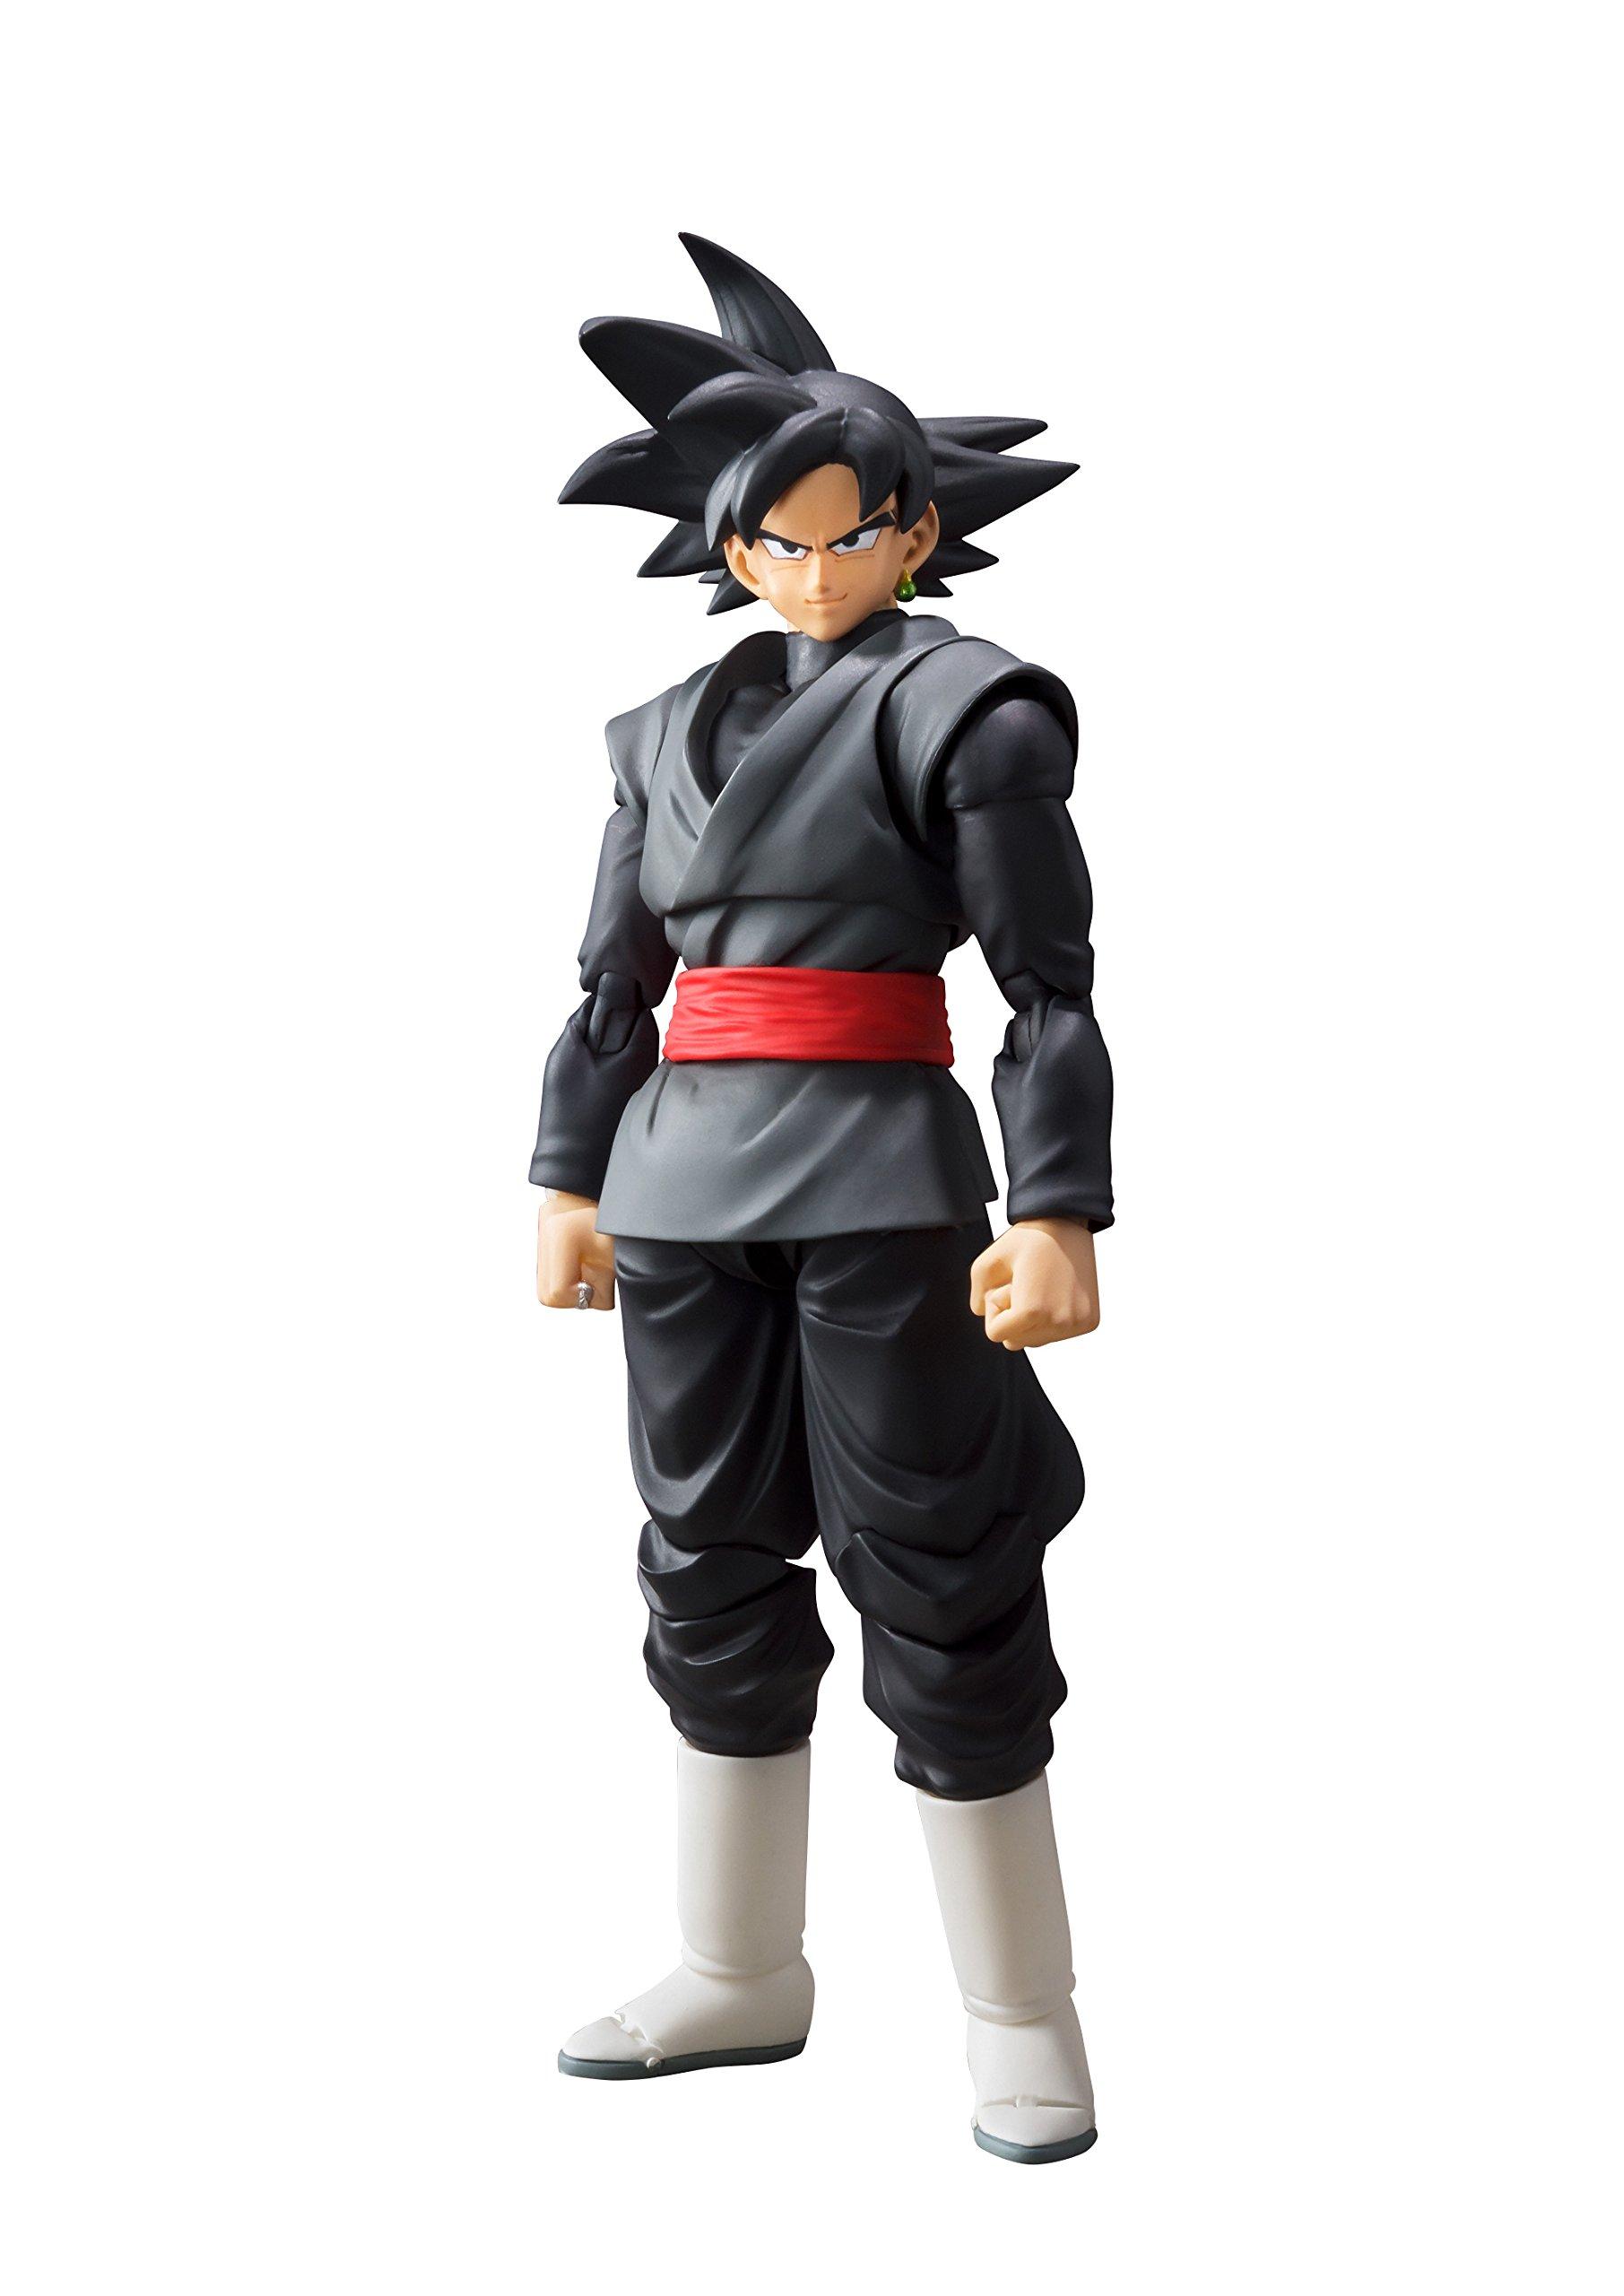 Bandai Tamashii Nations S.H. Figuarts Goku Black Dragon Ball Super Action Figure